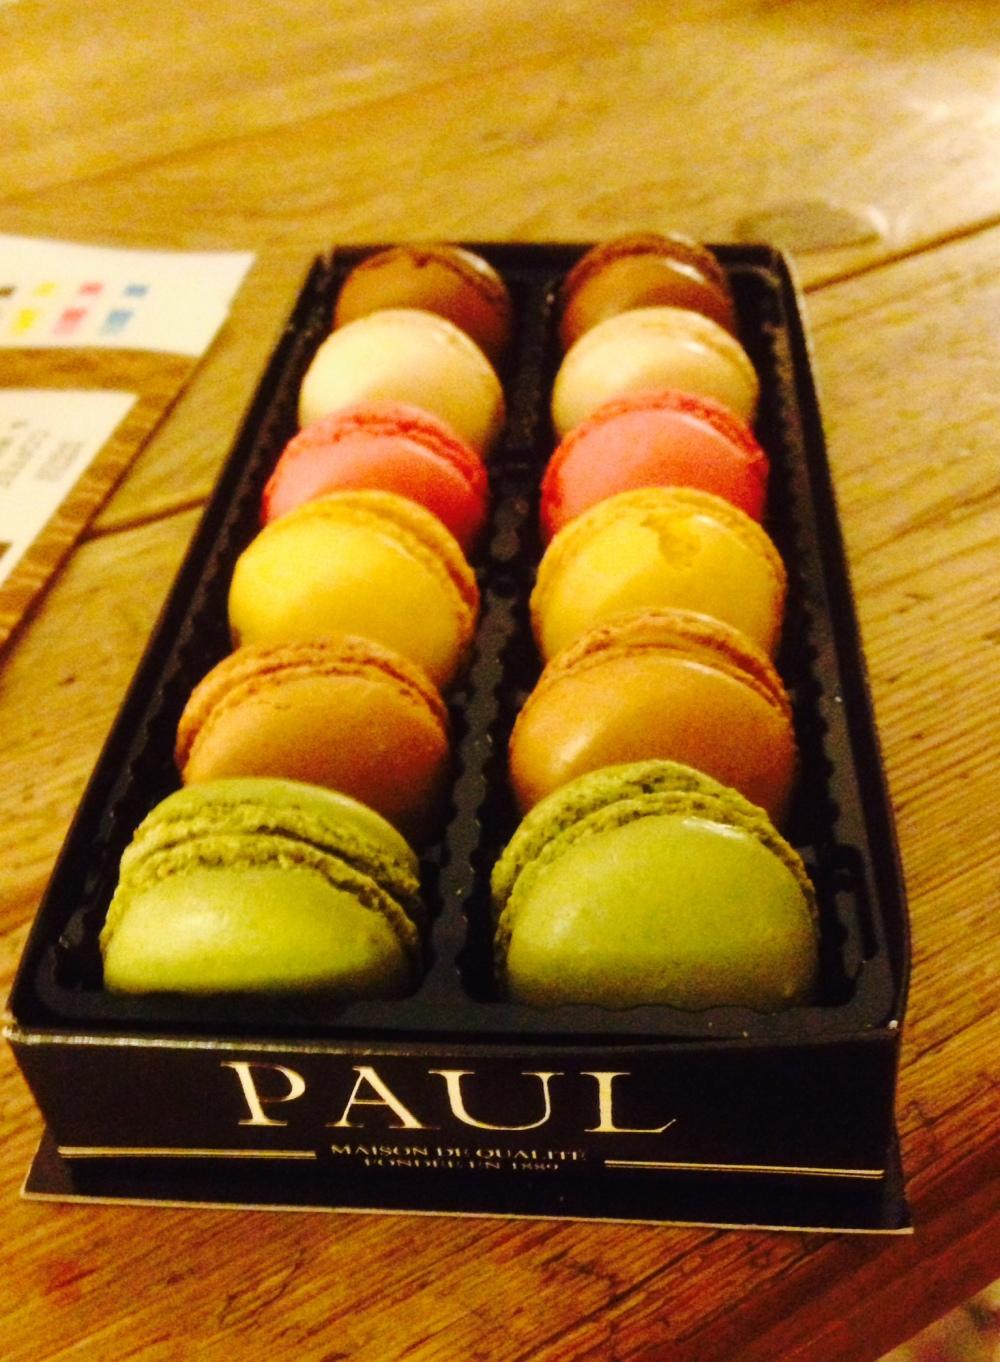 Paul's Macaroons